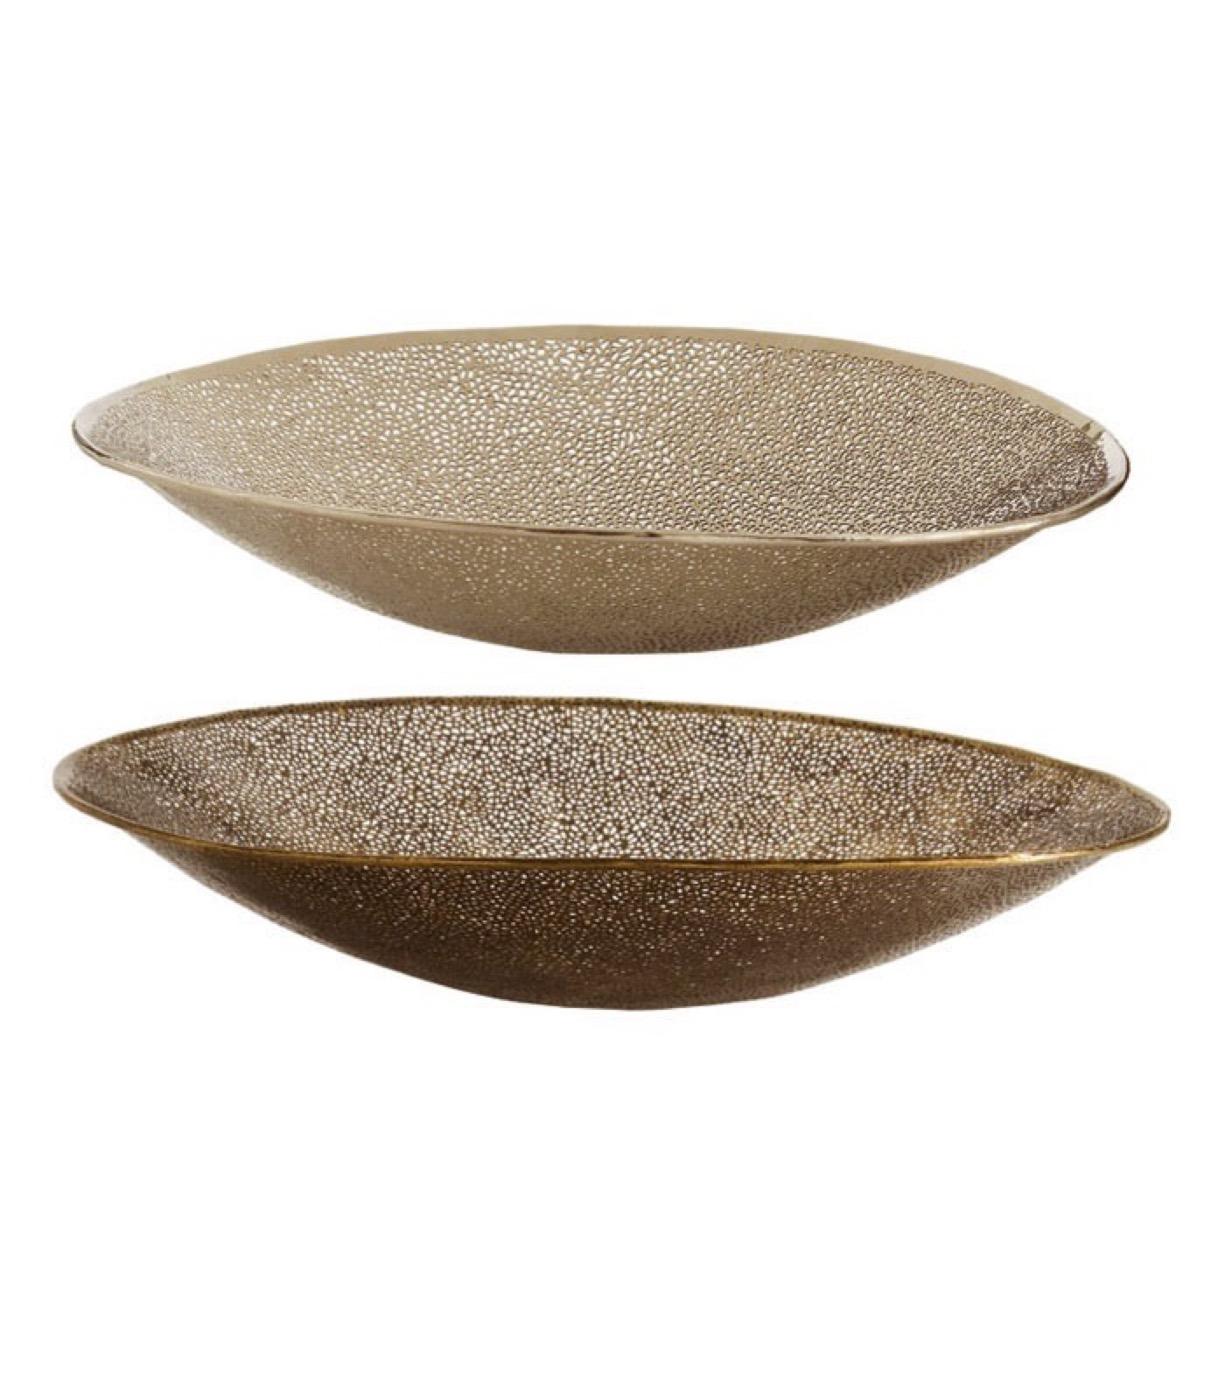 Mumbai Nickel & Brass Bowls Set